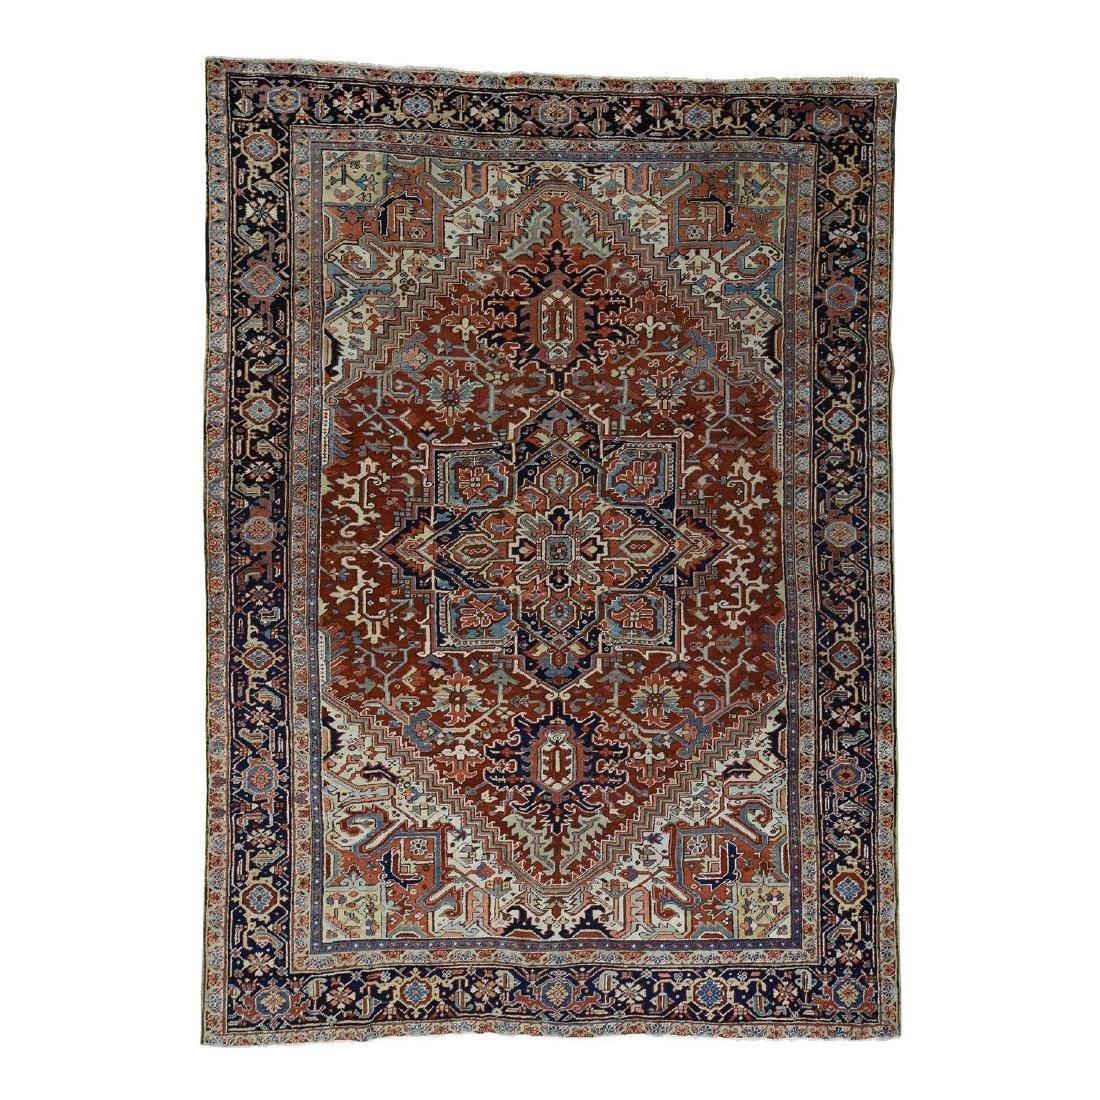 Antique Persian Heriz Full Pile Rug 8.9x12.2